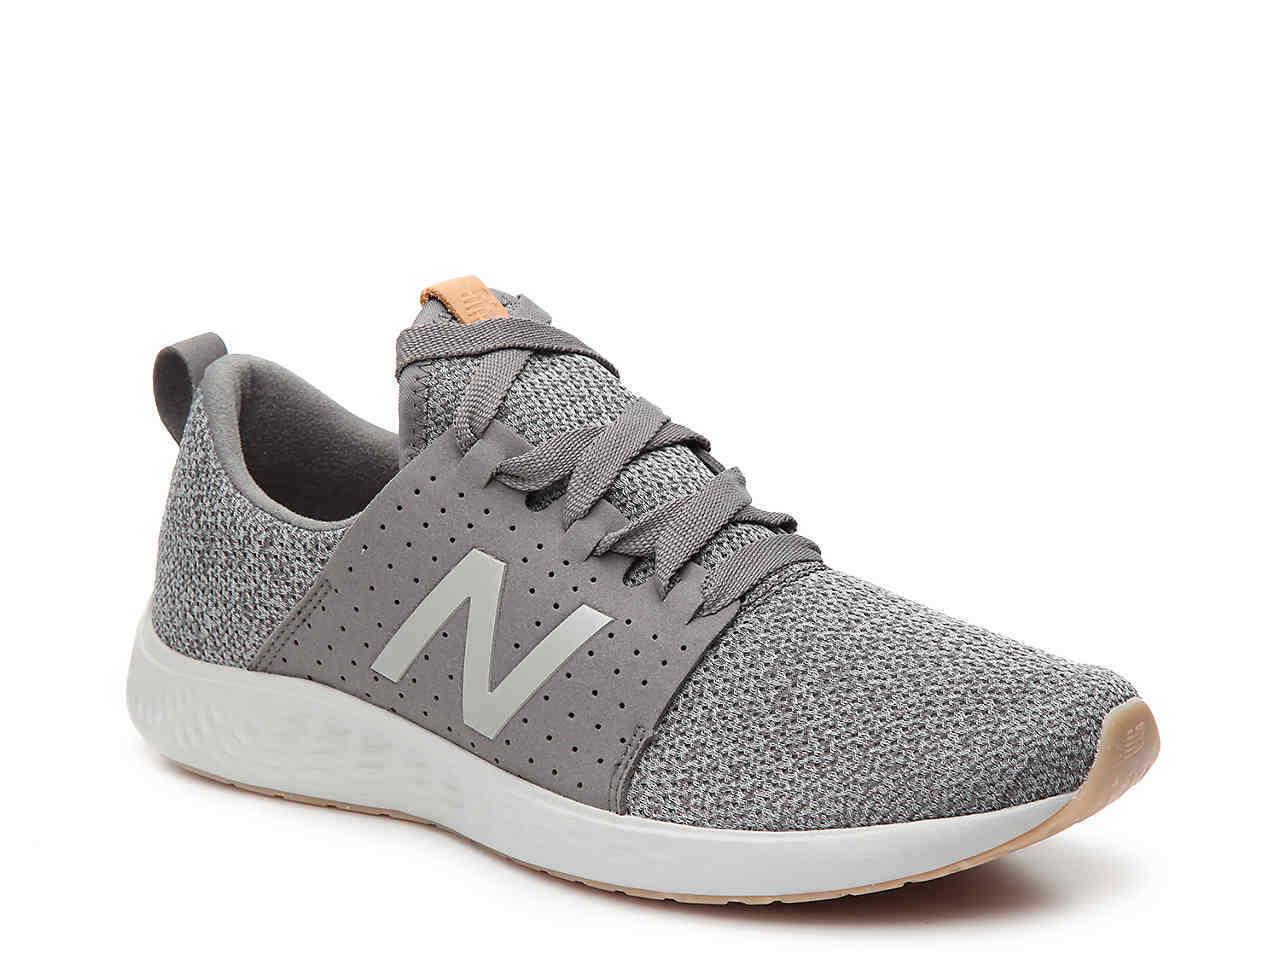 Nib New Balance Homme Fraîche Mousse zapatos Sport Med&4E Large Arishi Cruz